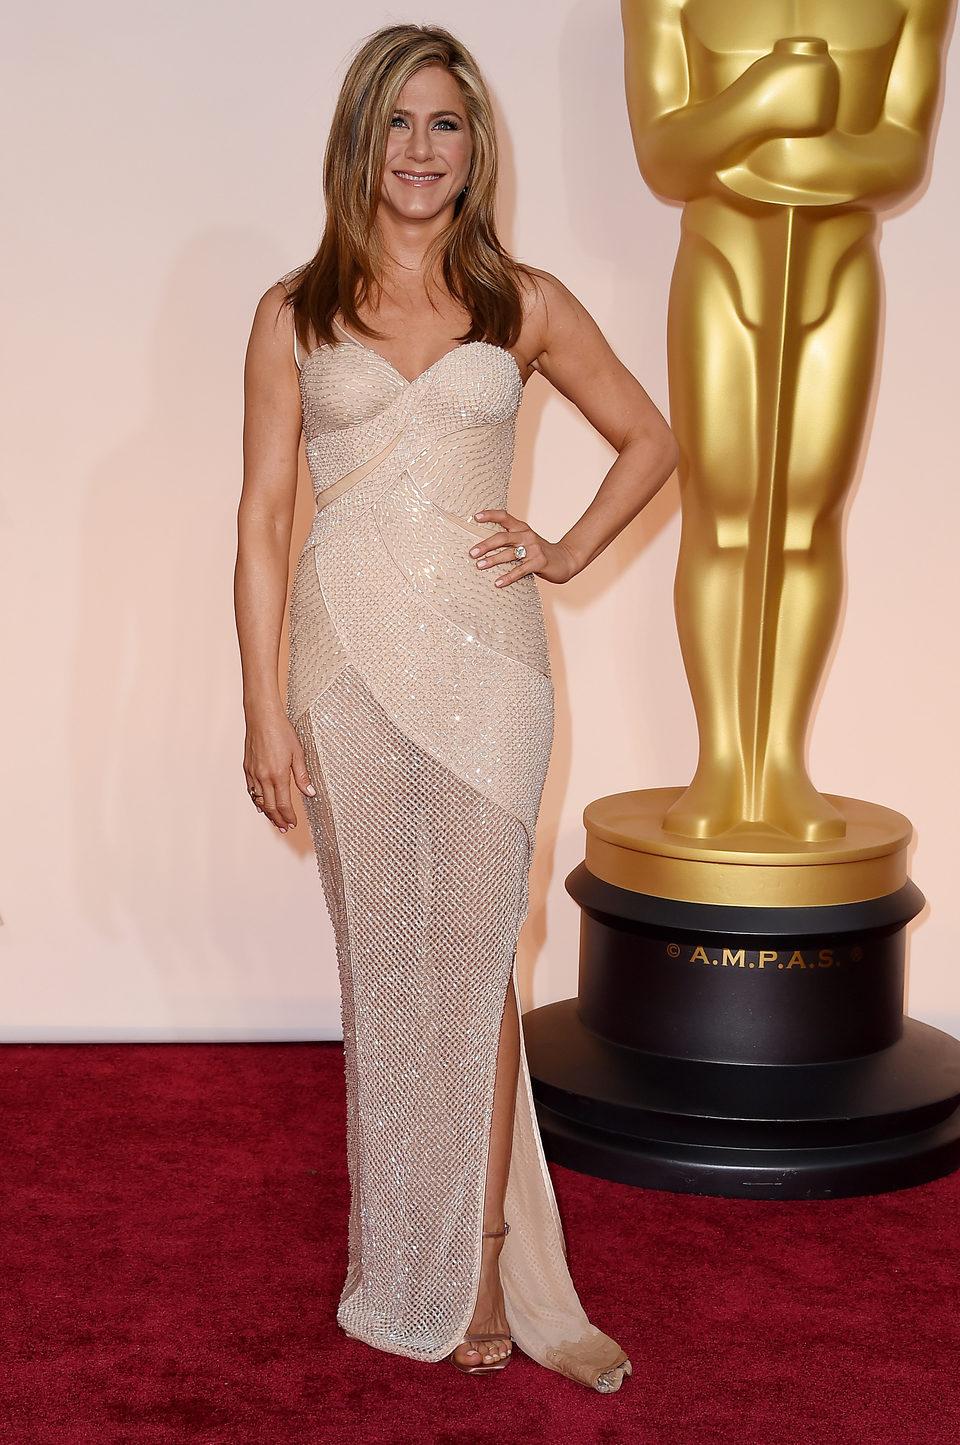 Jennifer Aniston at the Oscar 2015 red carpet